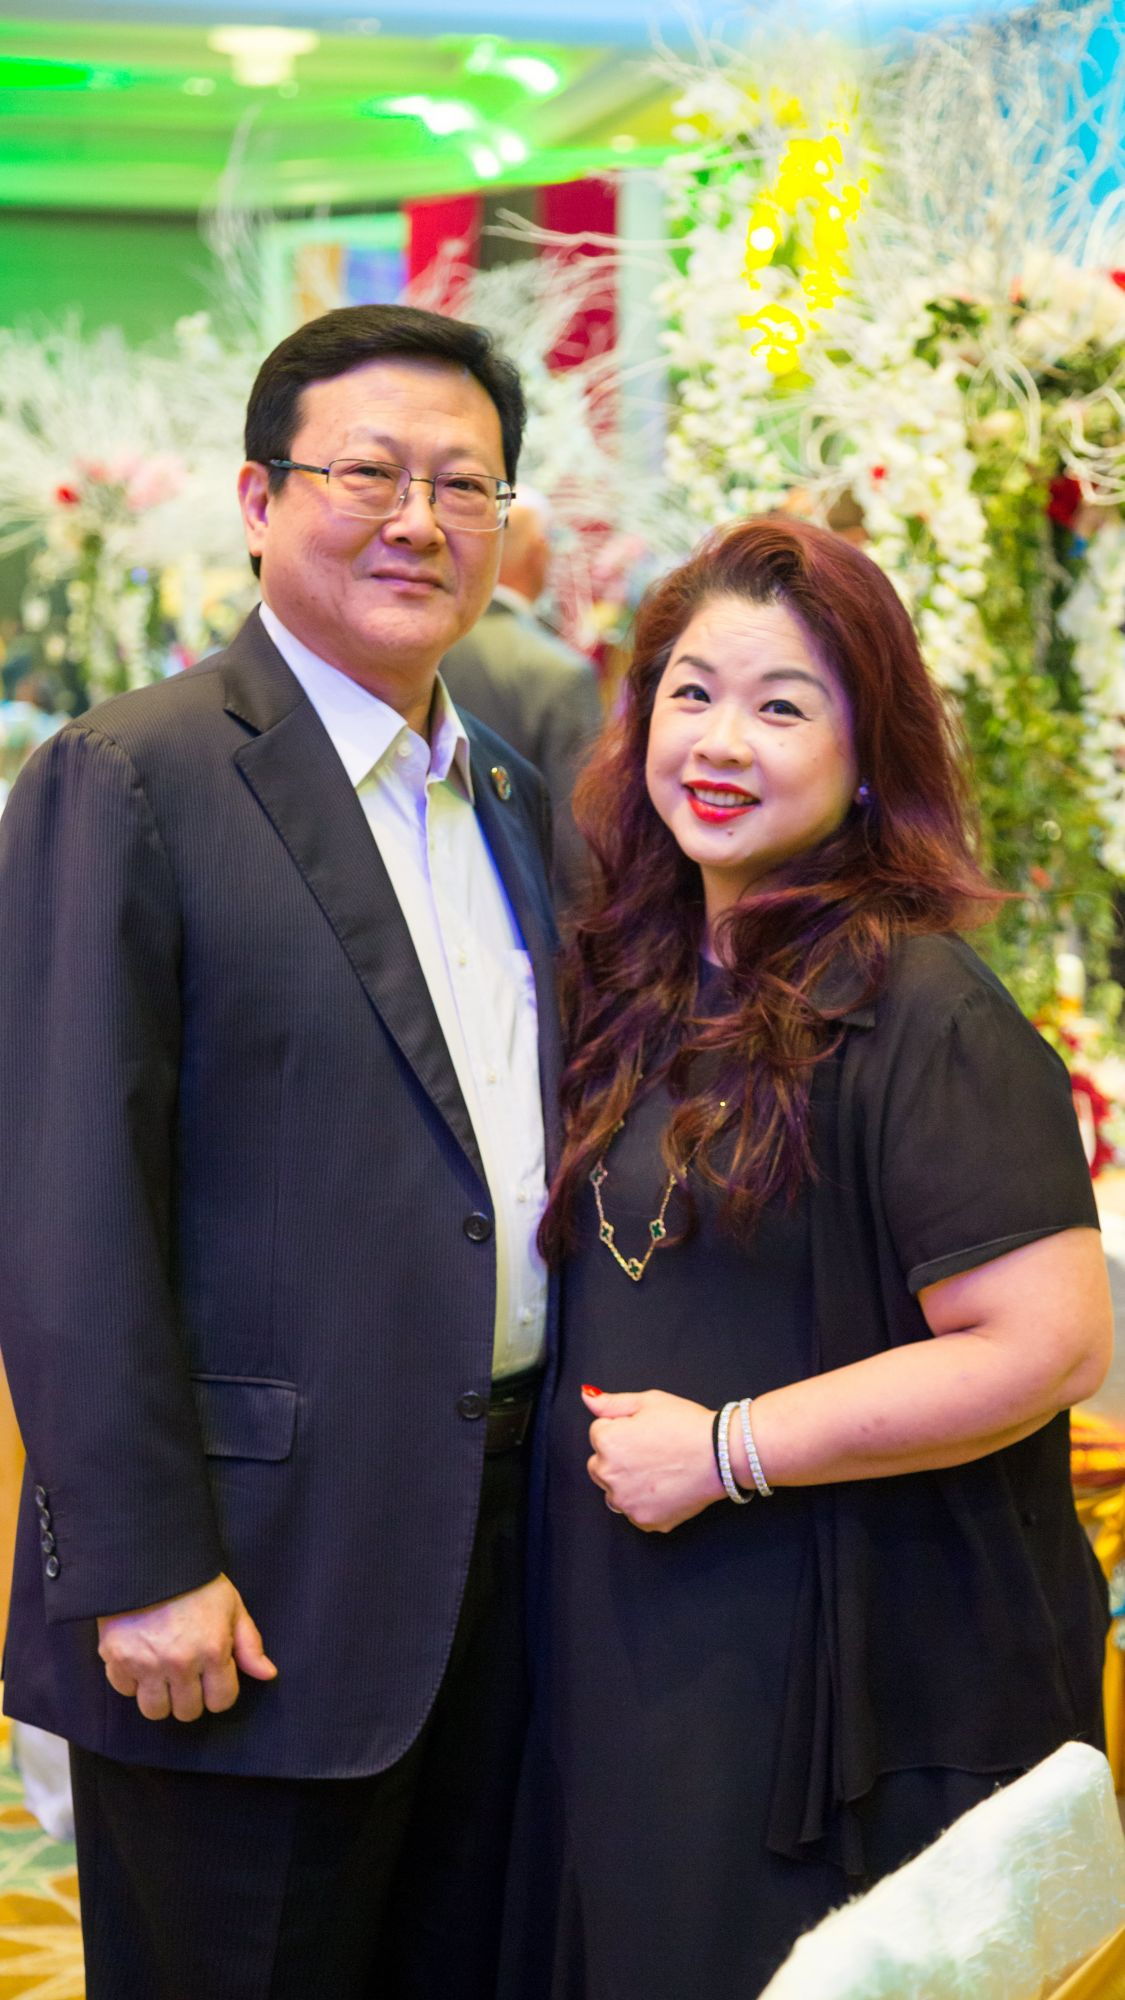 Tan Sri Tan Kean Soon and Puan Sri Shirley Law